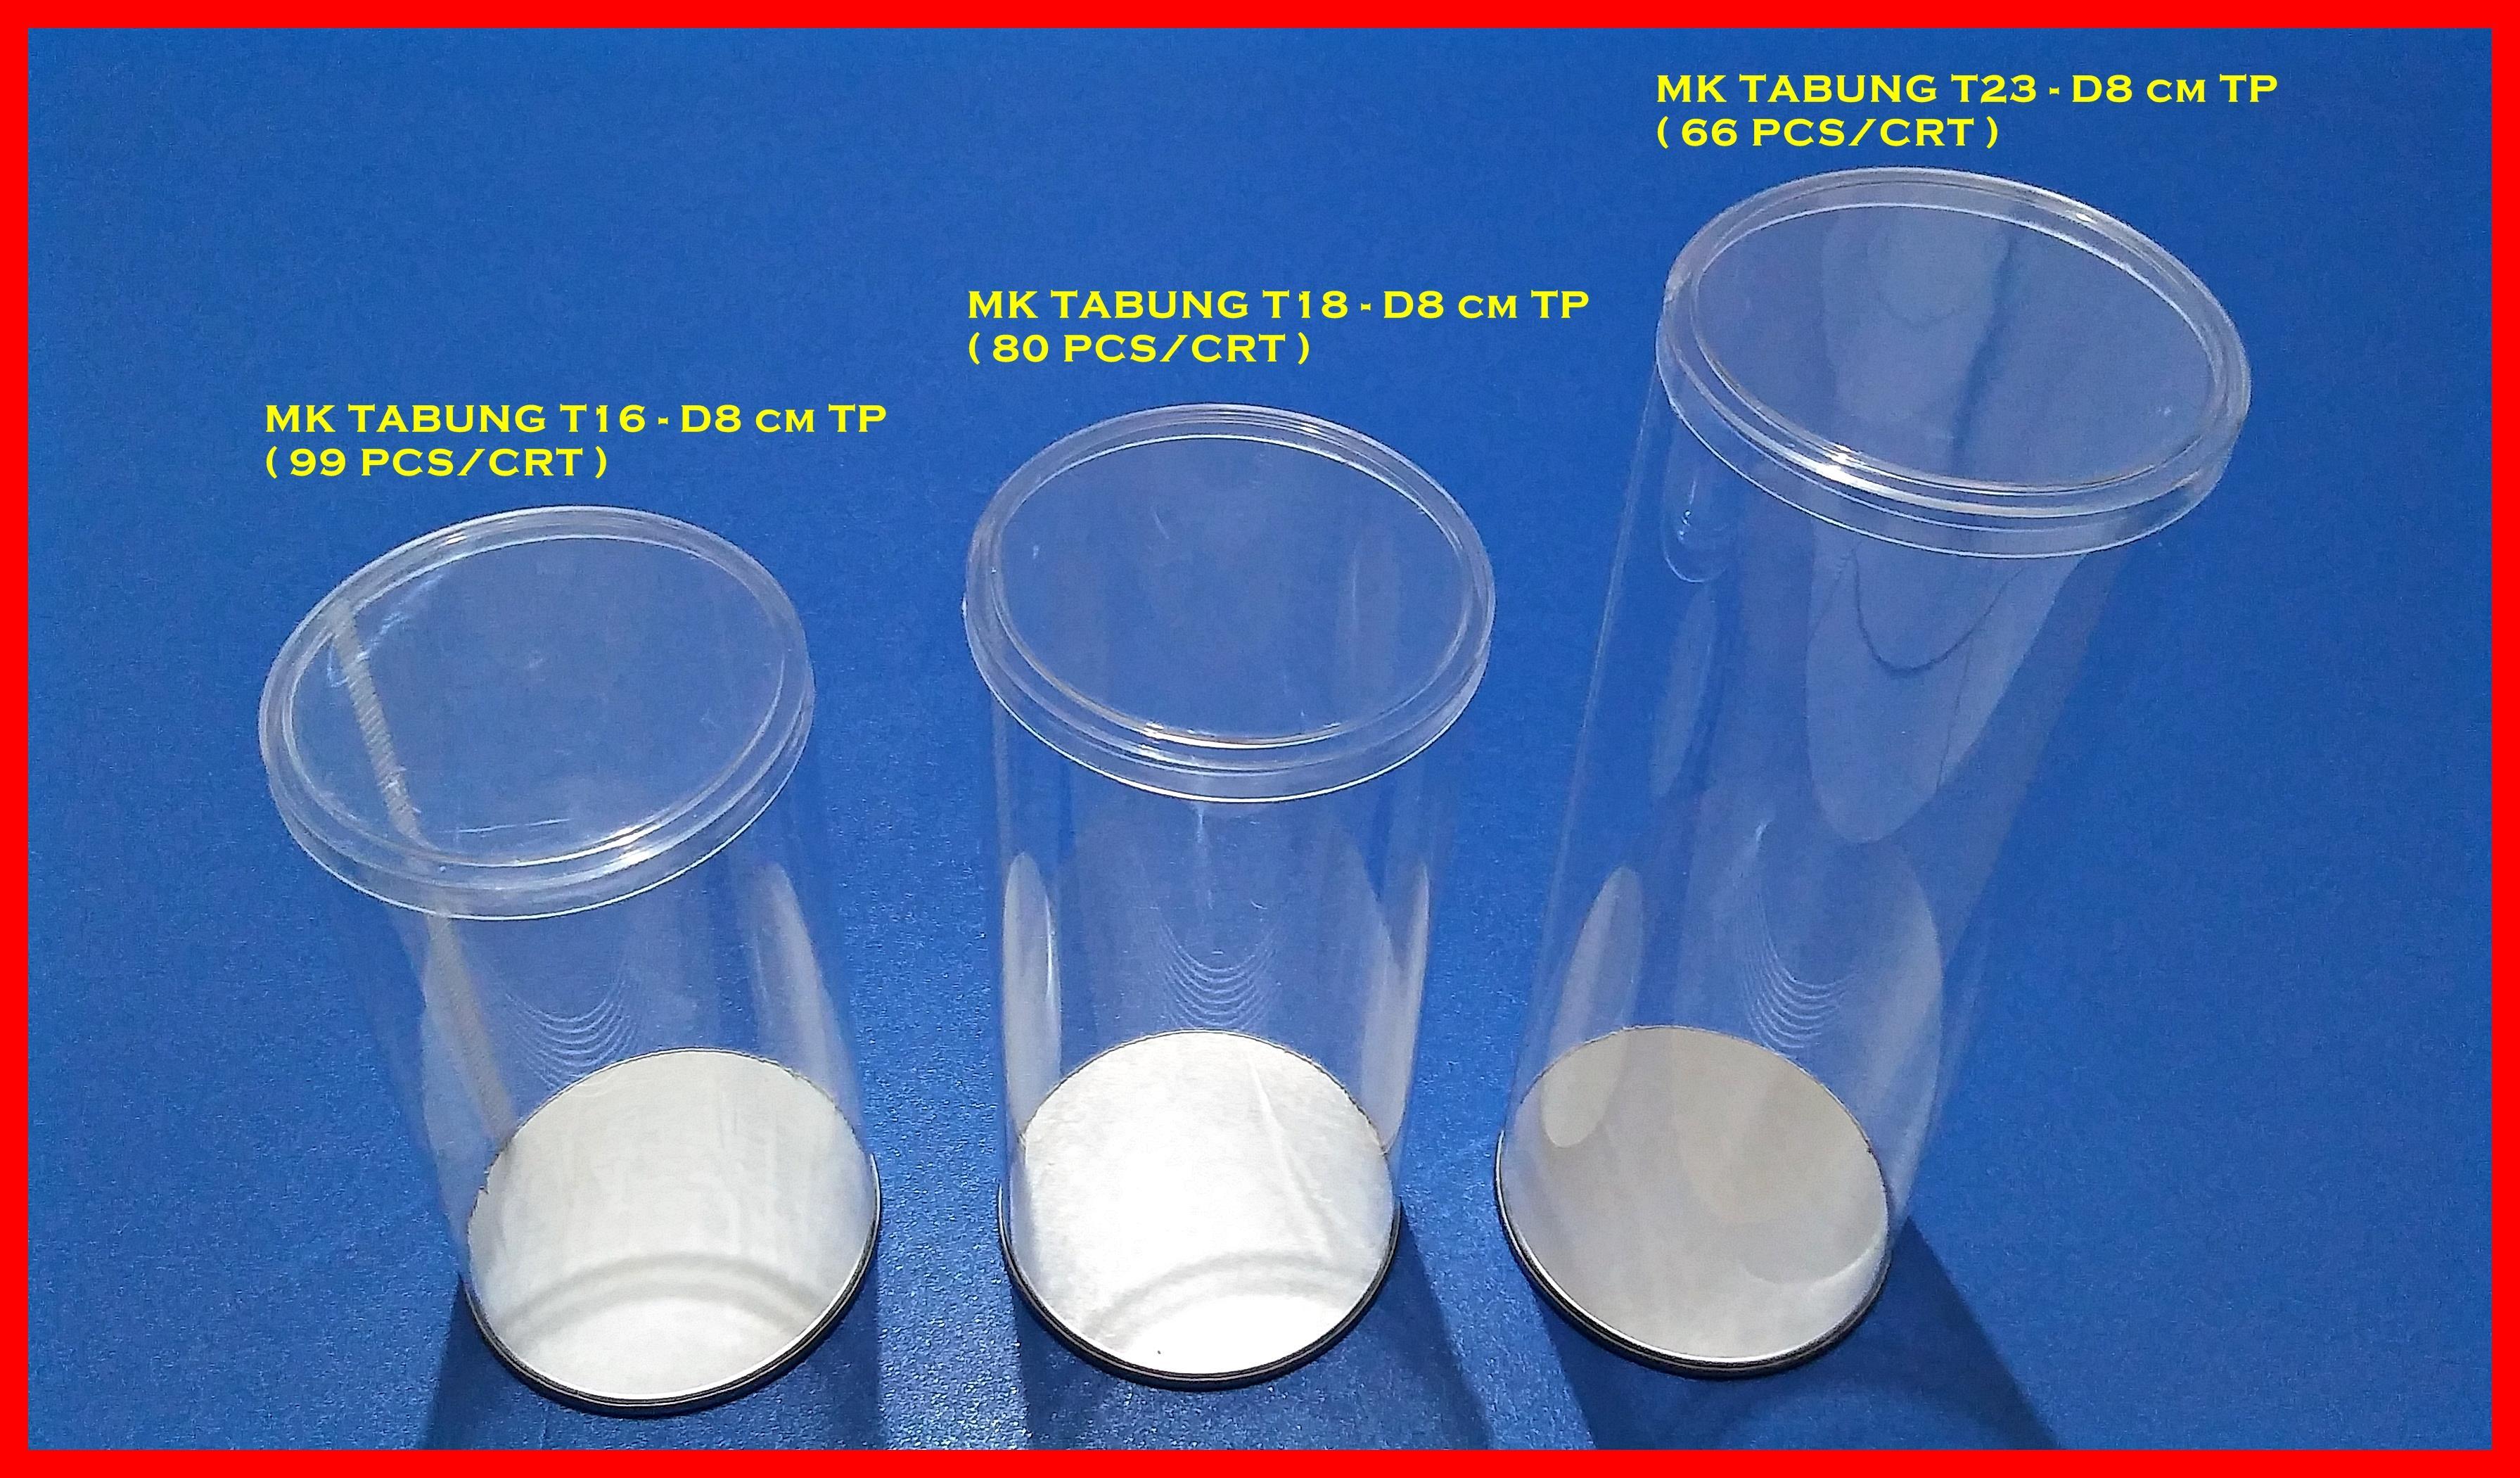 Jual Plastik Roll Pembungkus Harga Murah Berkualitas Indotrading Bagus Cling Wrap Box 45 Cm X 30 M Polyethylene Non Pvc Mika Tabung